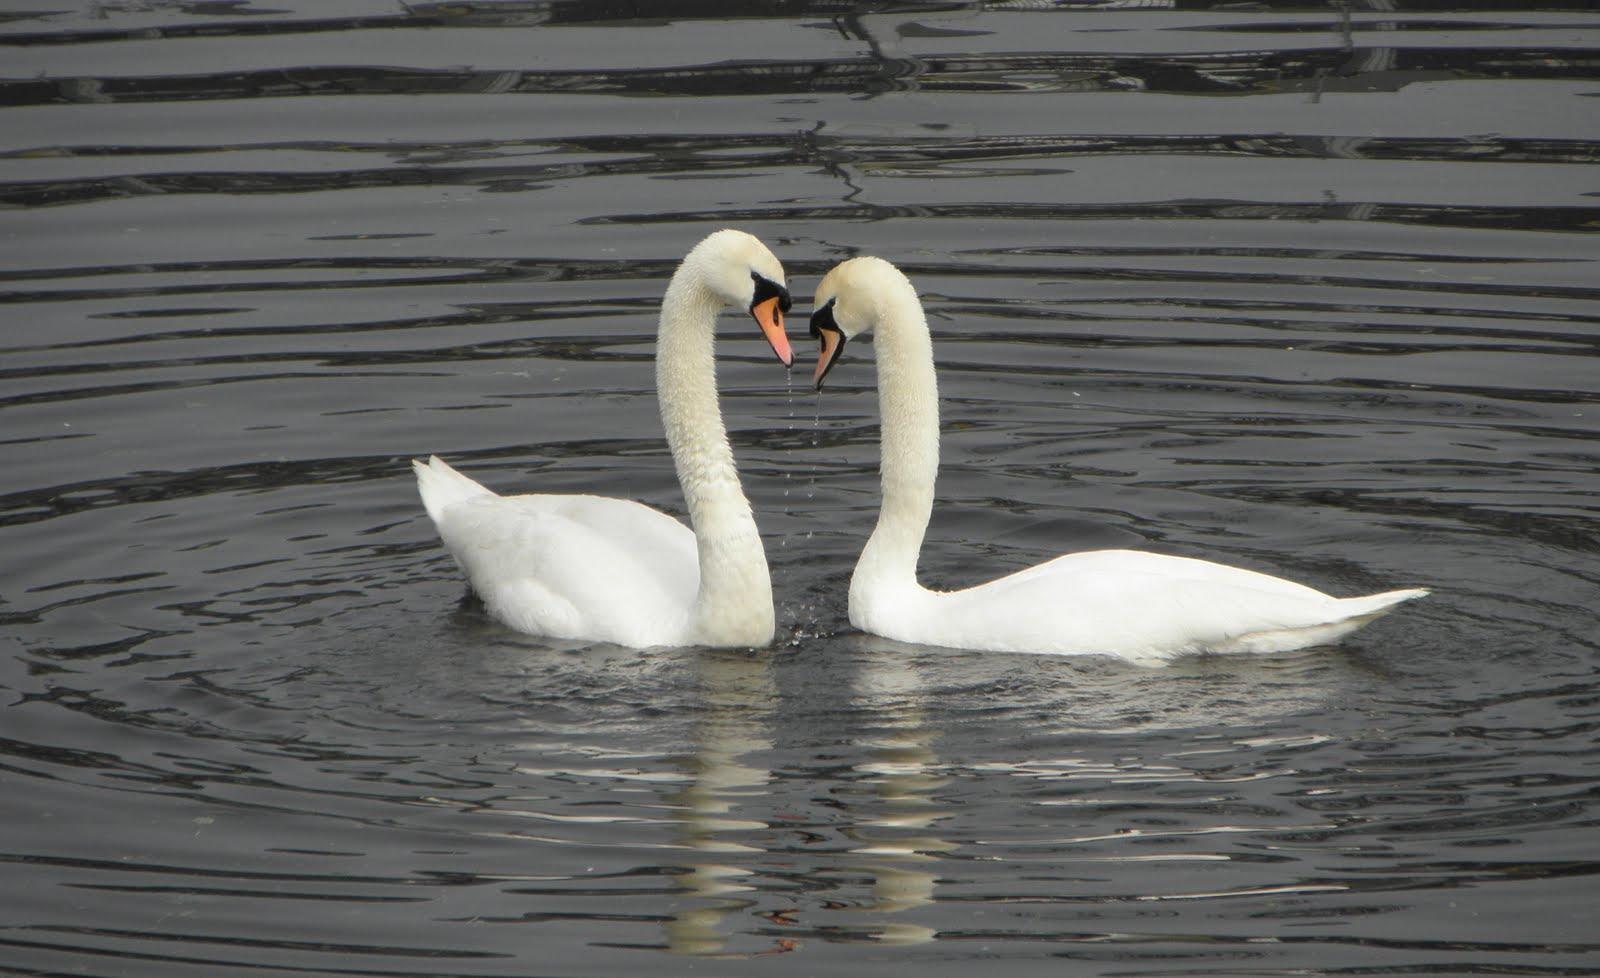 Hackney wick swans